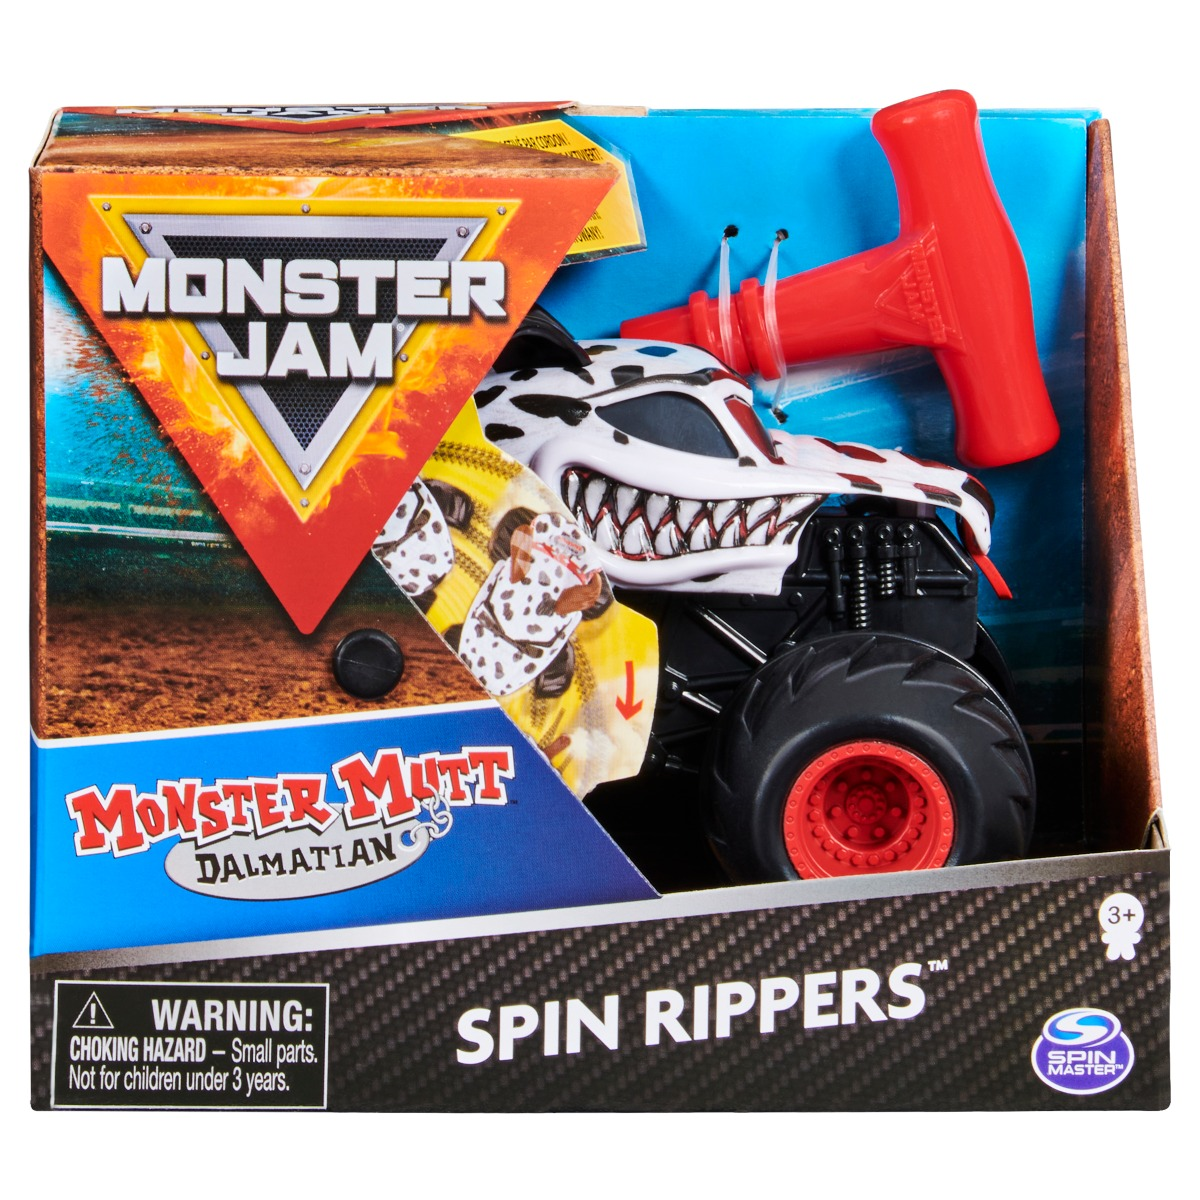 Masinuta Monster Jam, Scara 1:43, Monster Mutt Dalmatian Spin Rippers imagine